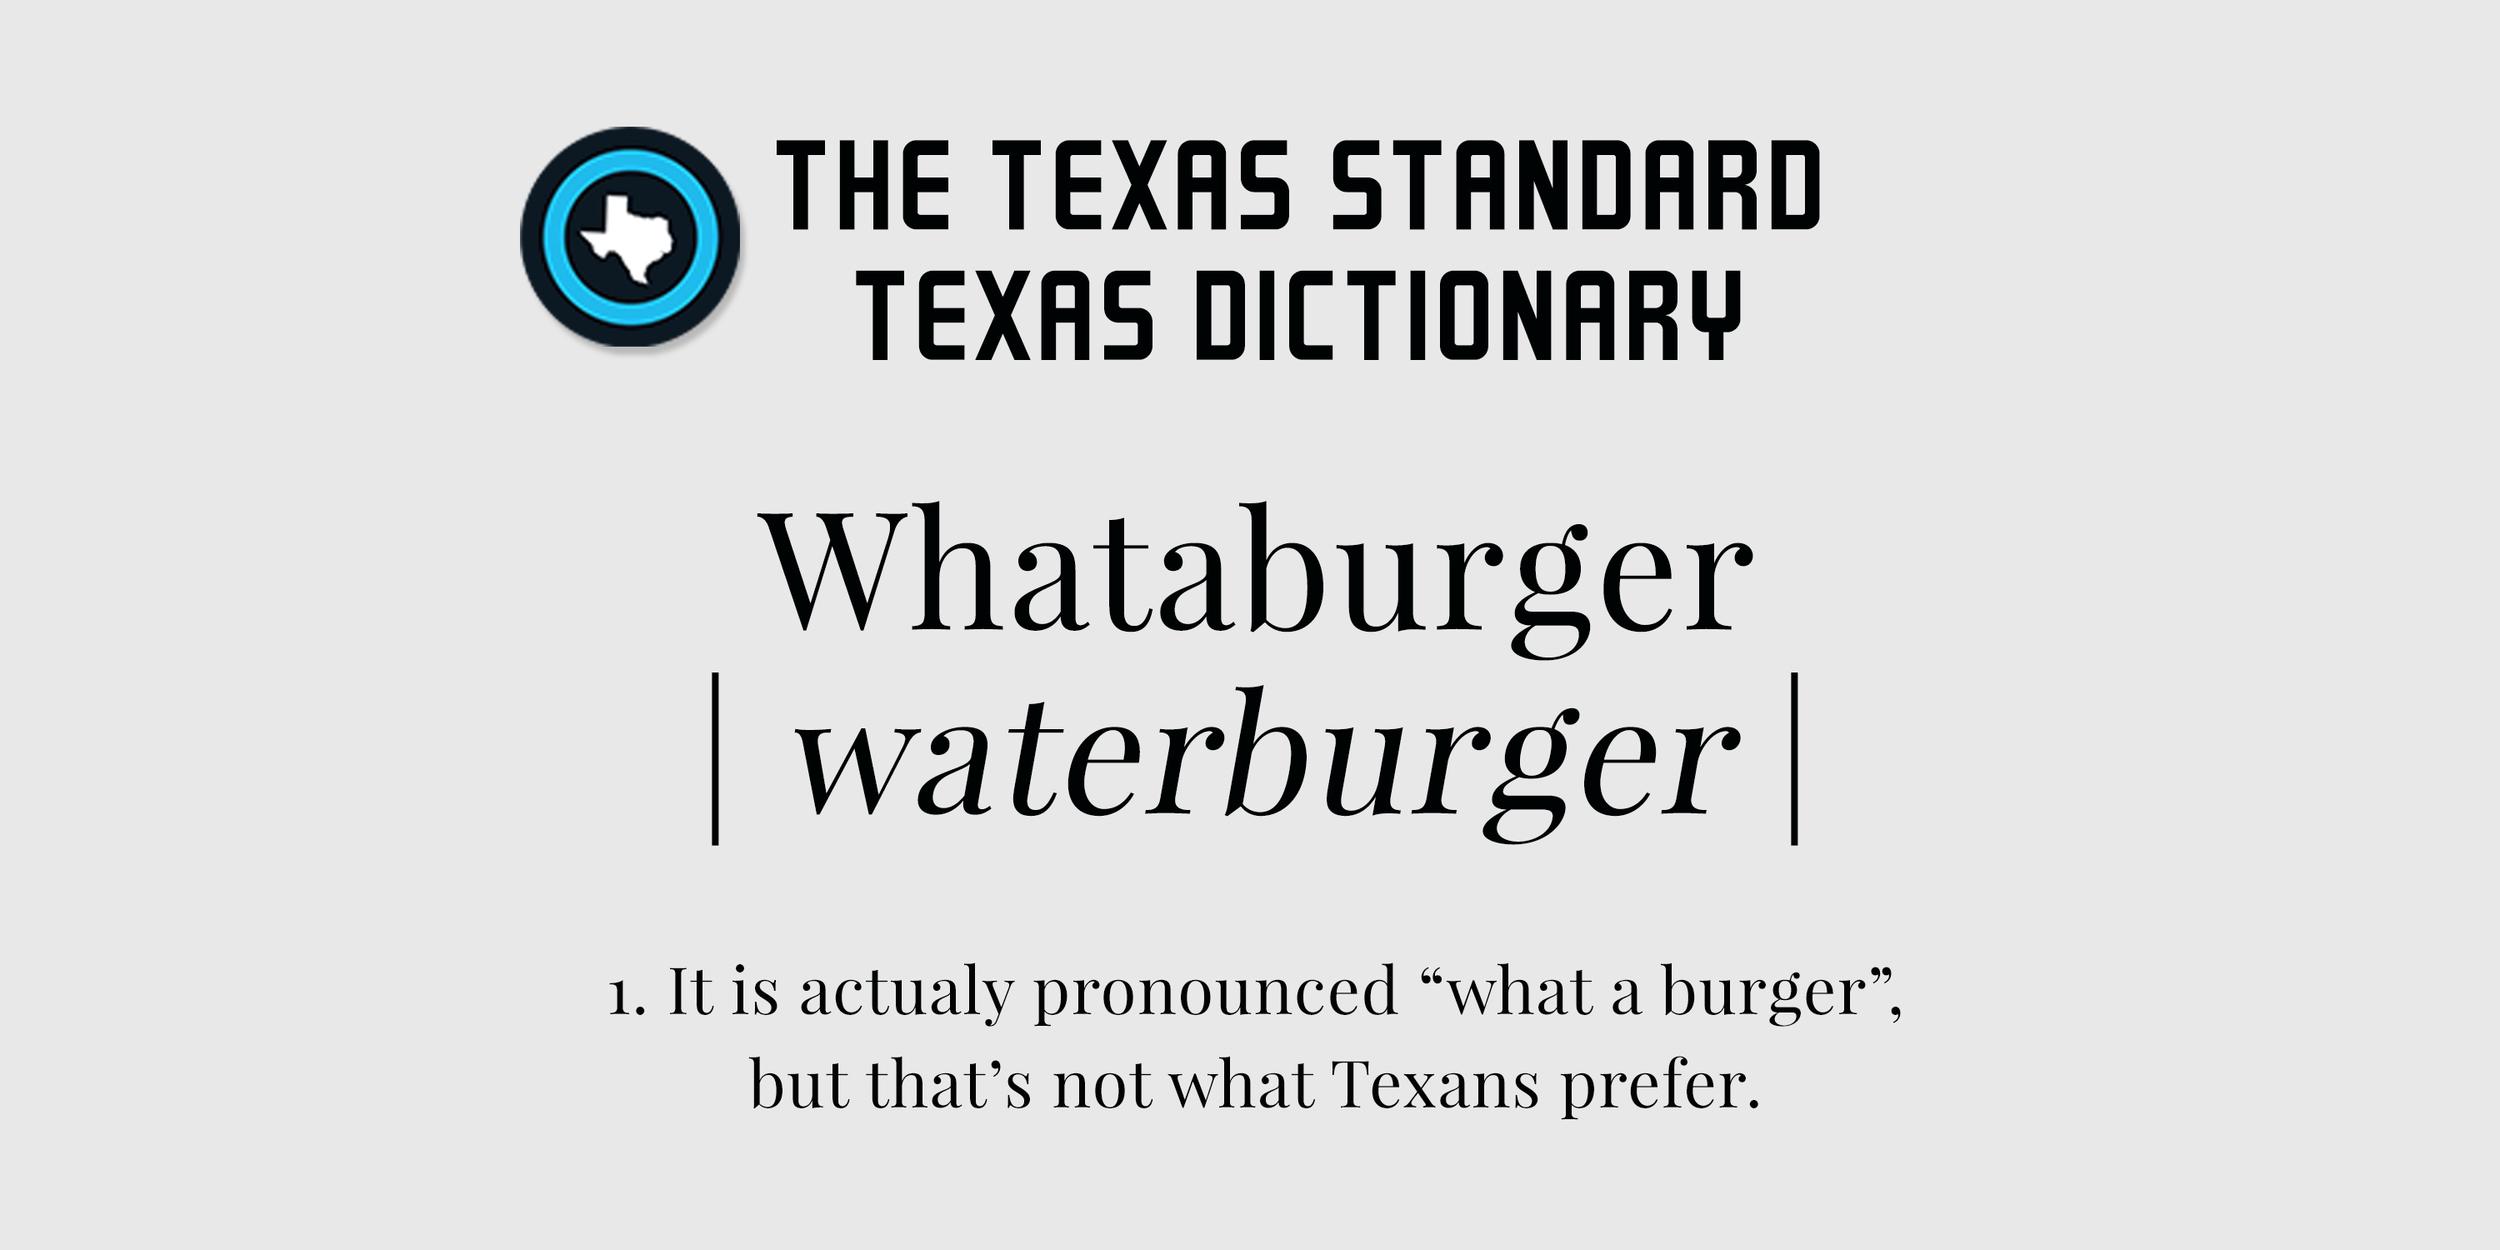 TexasStandard_TXDictionary_Whataburger.jpg